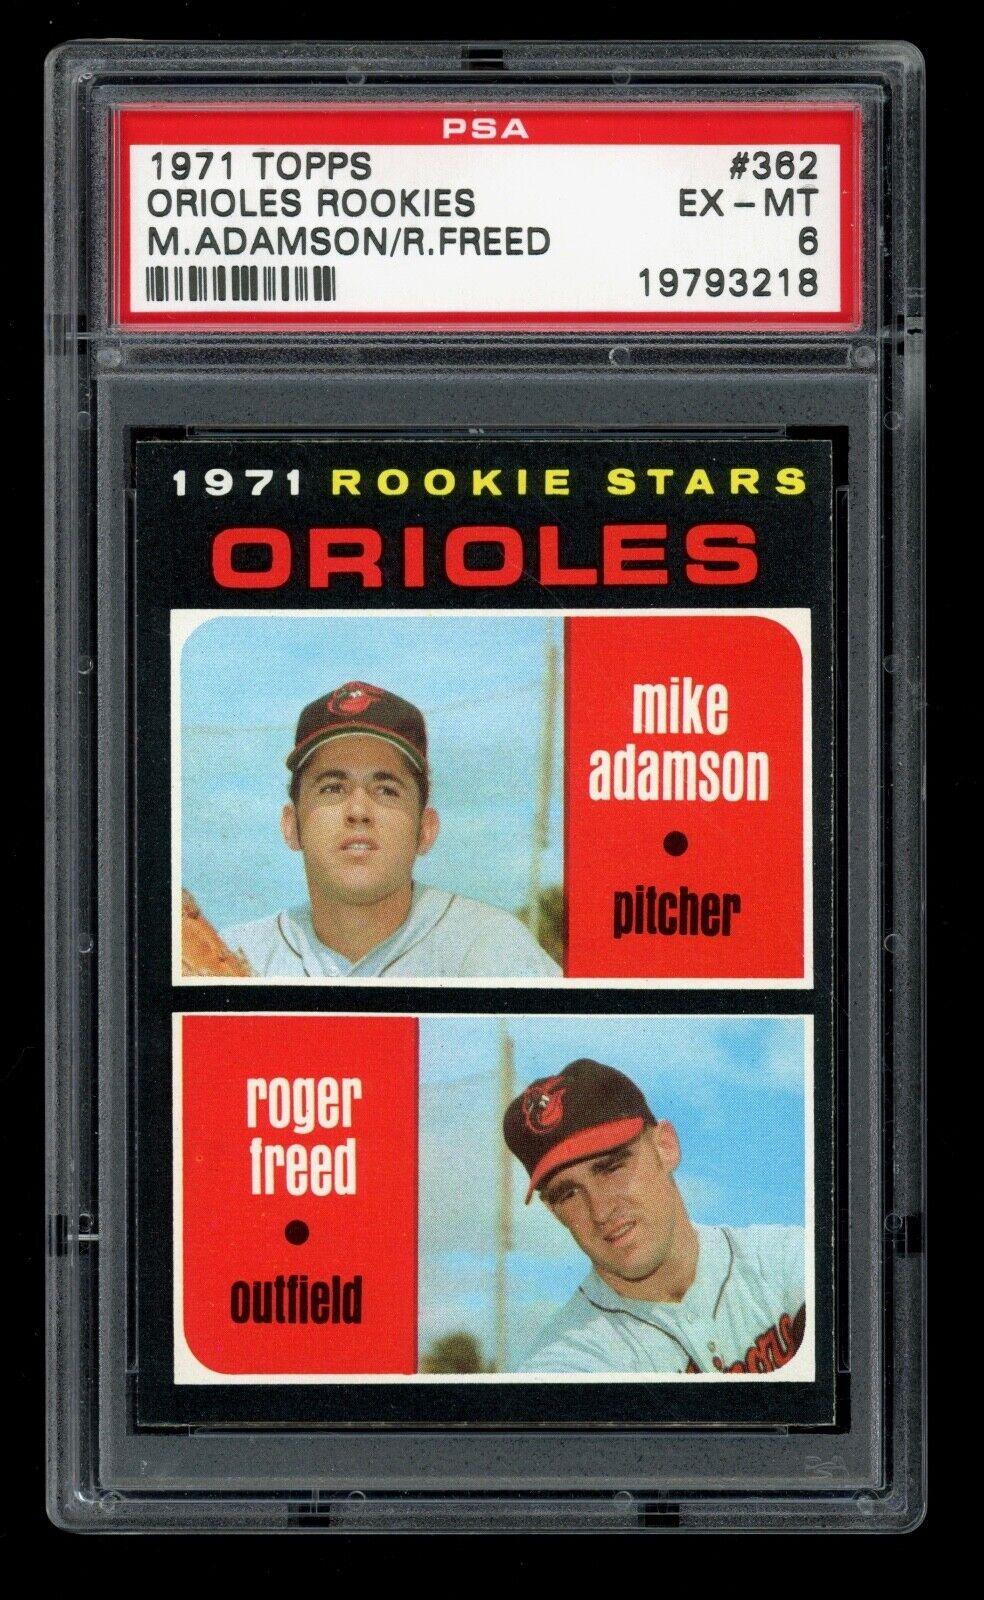 1971 Topps Baseball 362 Mike Adamson / Roger Freed PSA 6 EX-MT - ID016 - $12.50